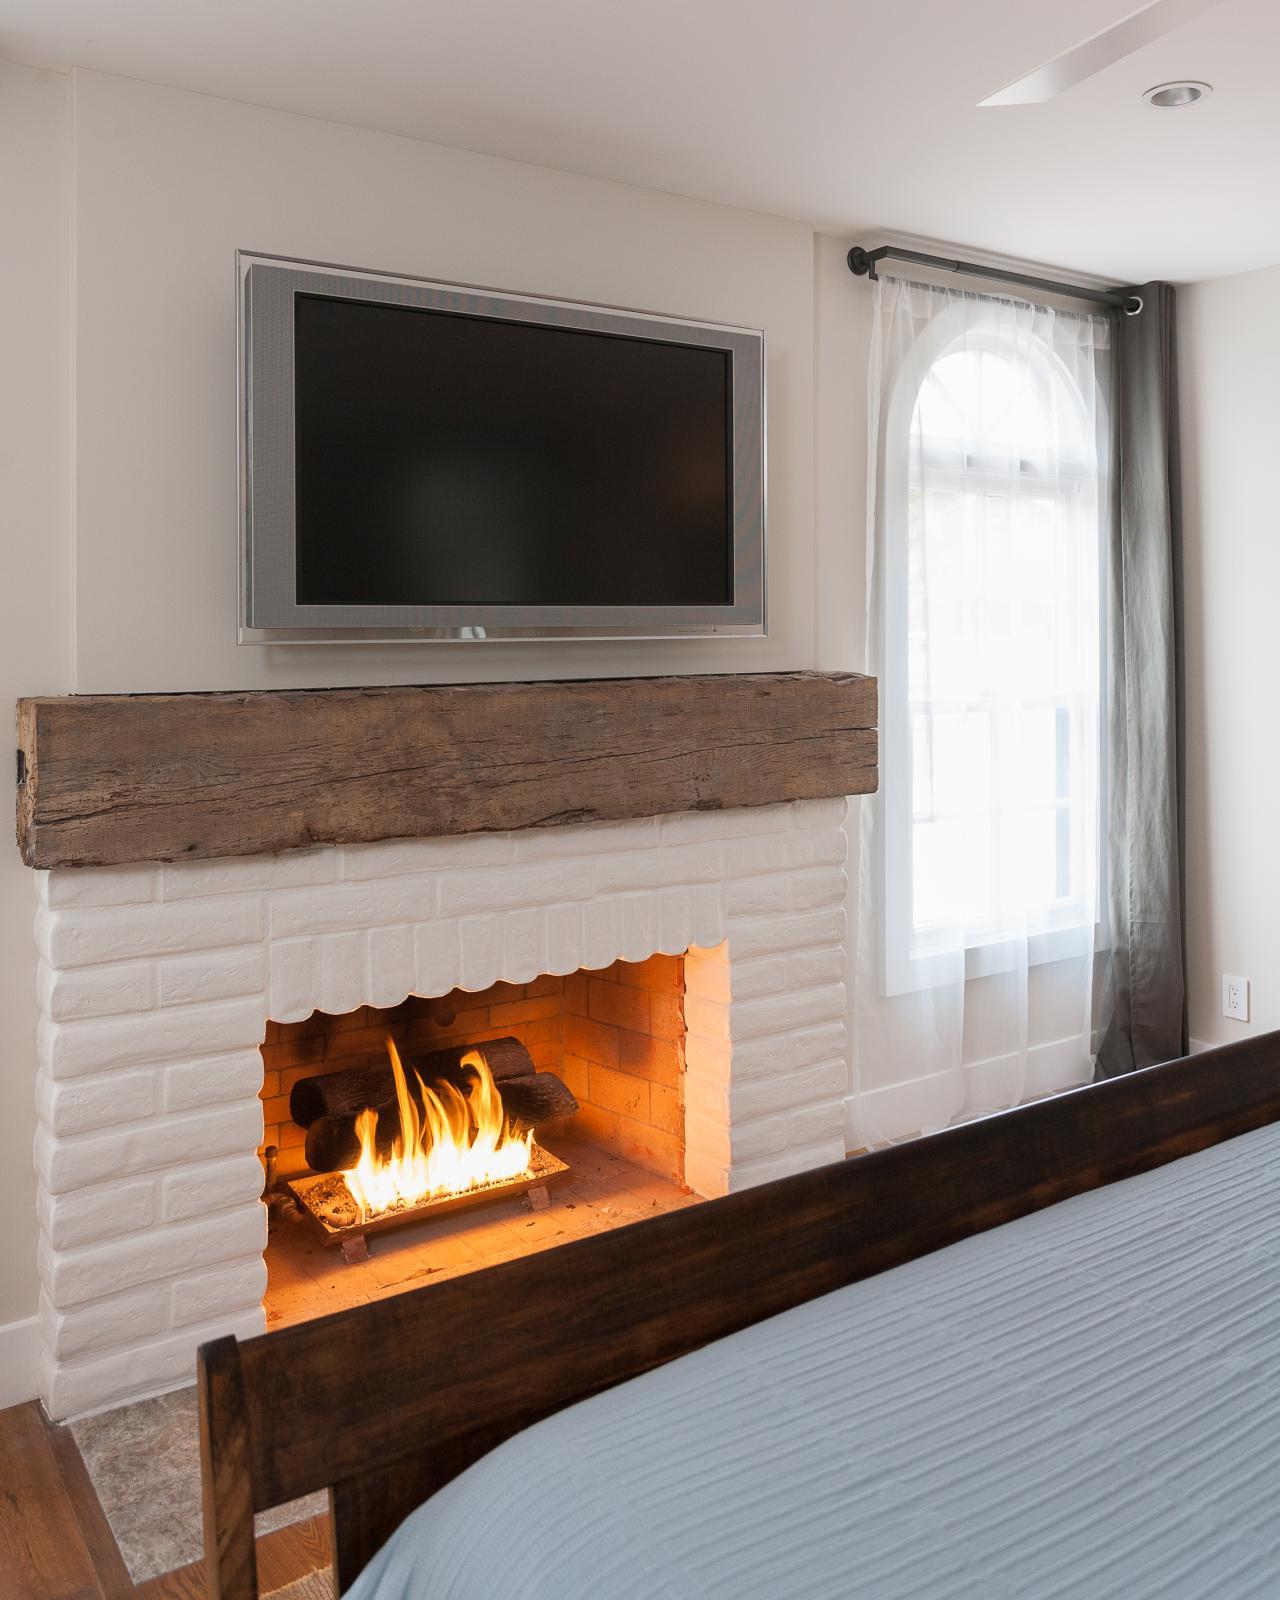 15 Gorgeous Painted Brick Fireplaces Hgtv 39 S Decorating Design Blog Hgtv